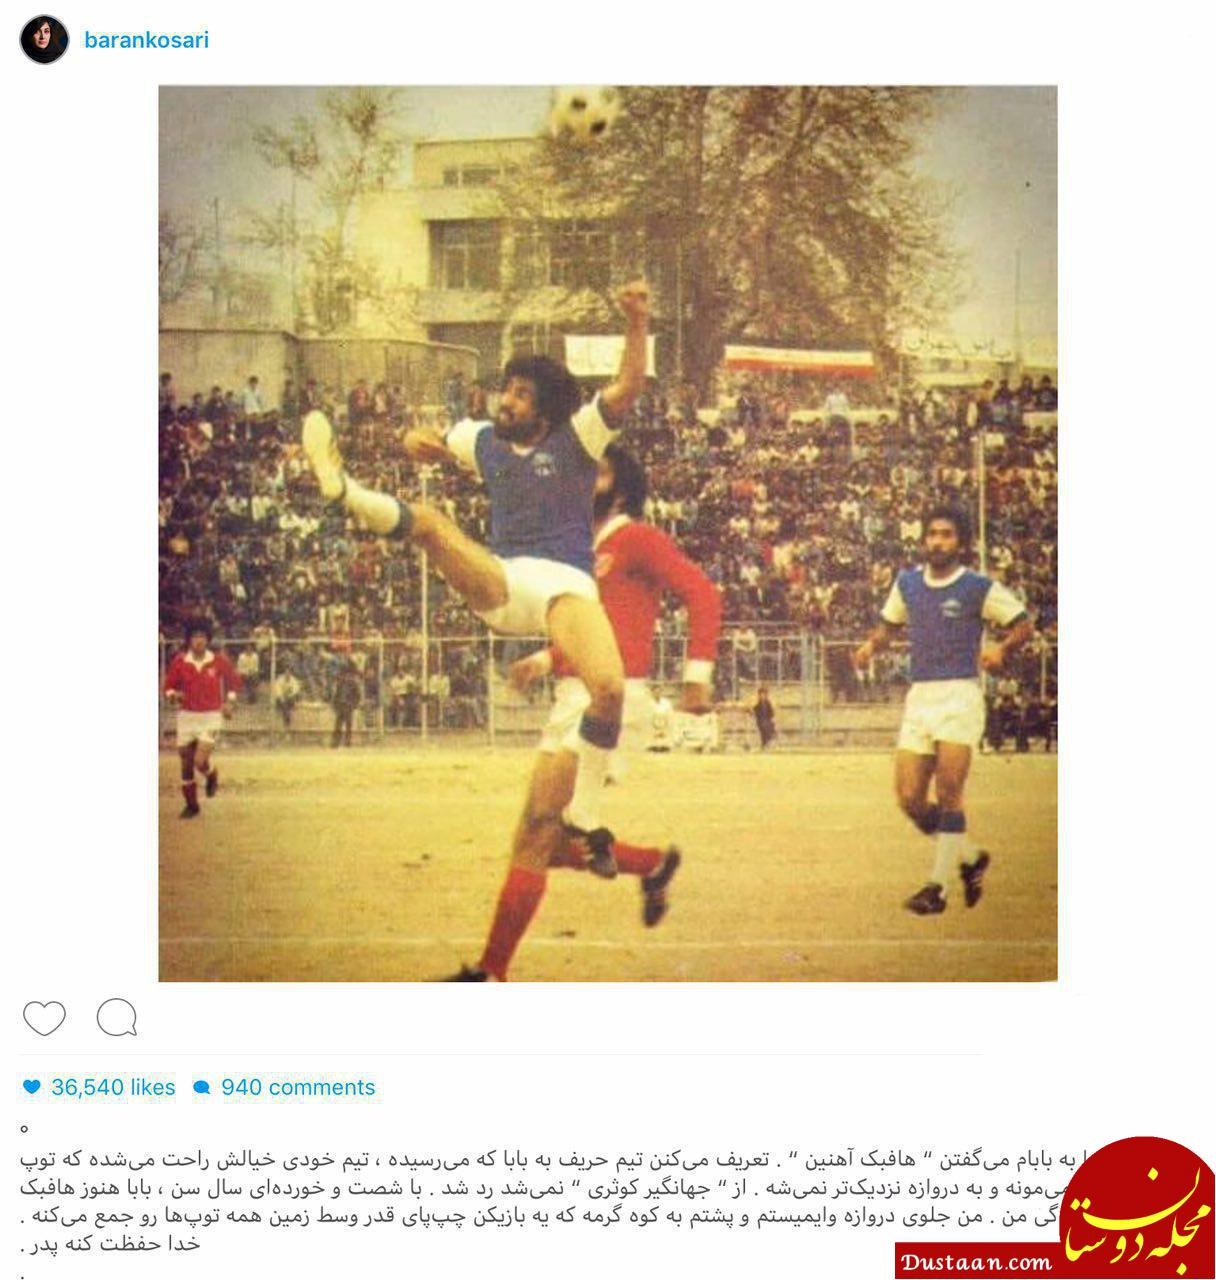 www.dustaan.com تمجید اینستاگرامى باران کوثرى از پدرش جهانگیر کوثرى فوتبالیست پیشکسوت